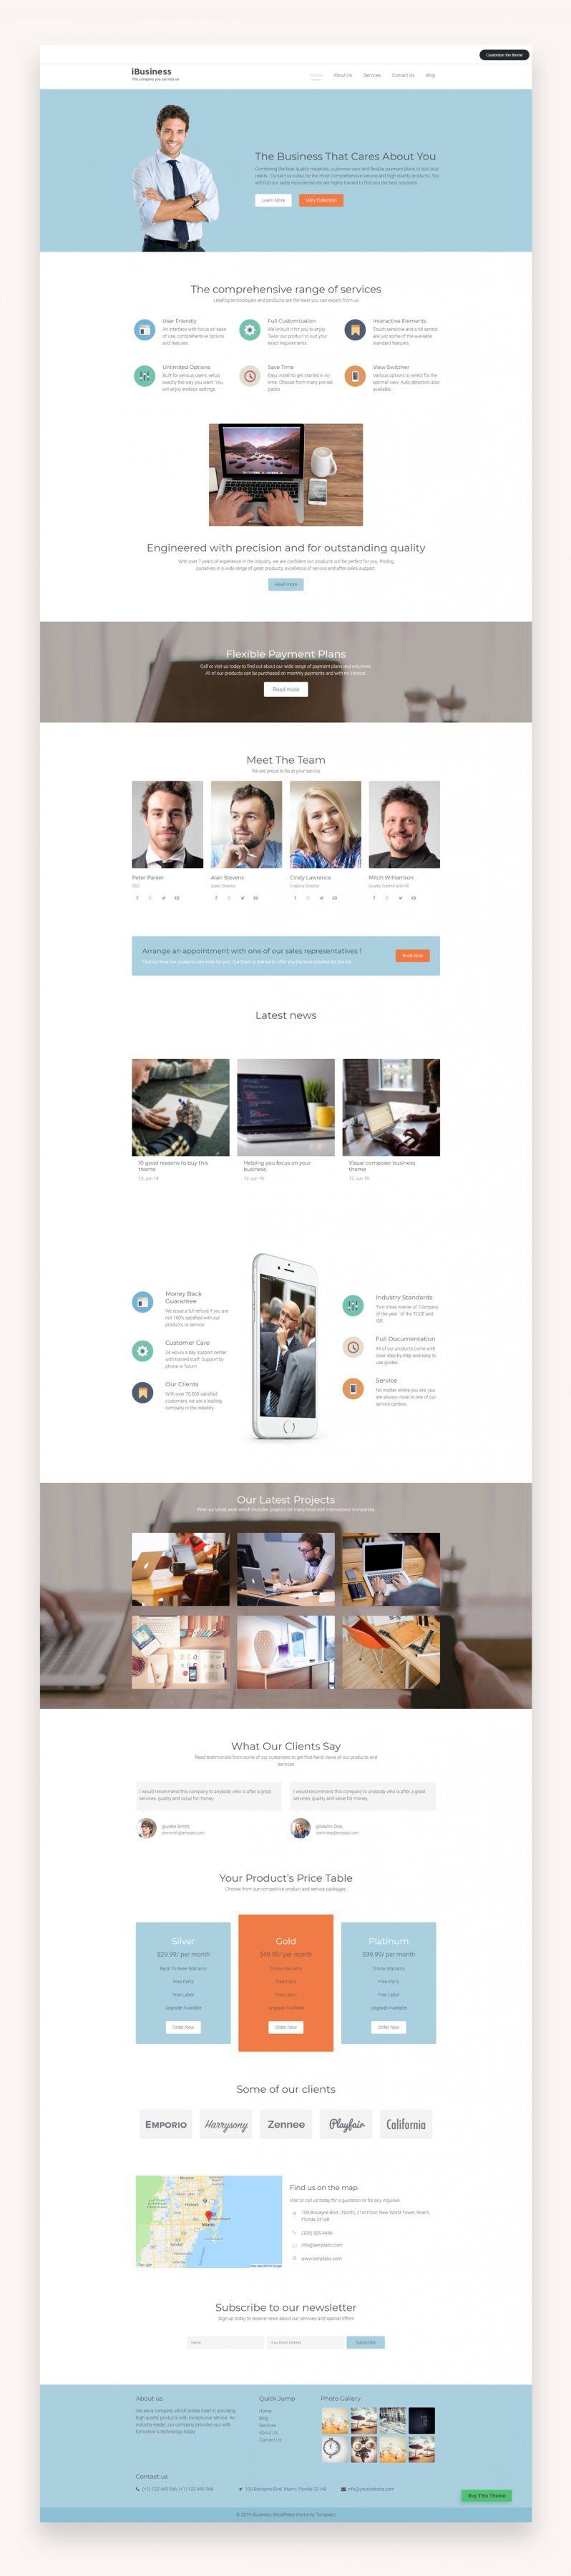 Ibusiness - Responsive Business WordPress Theme